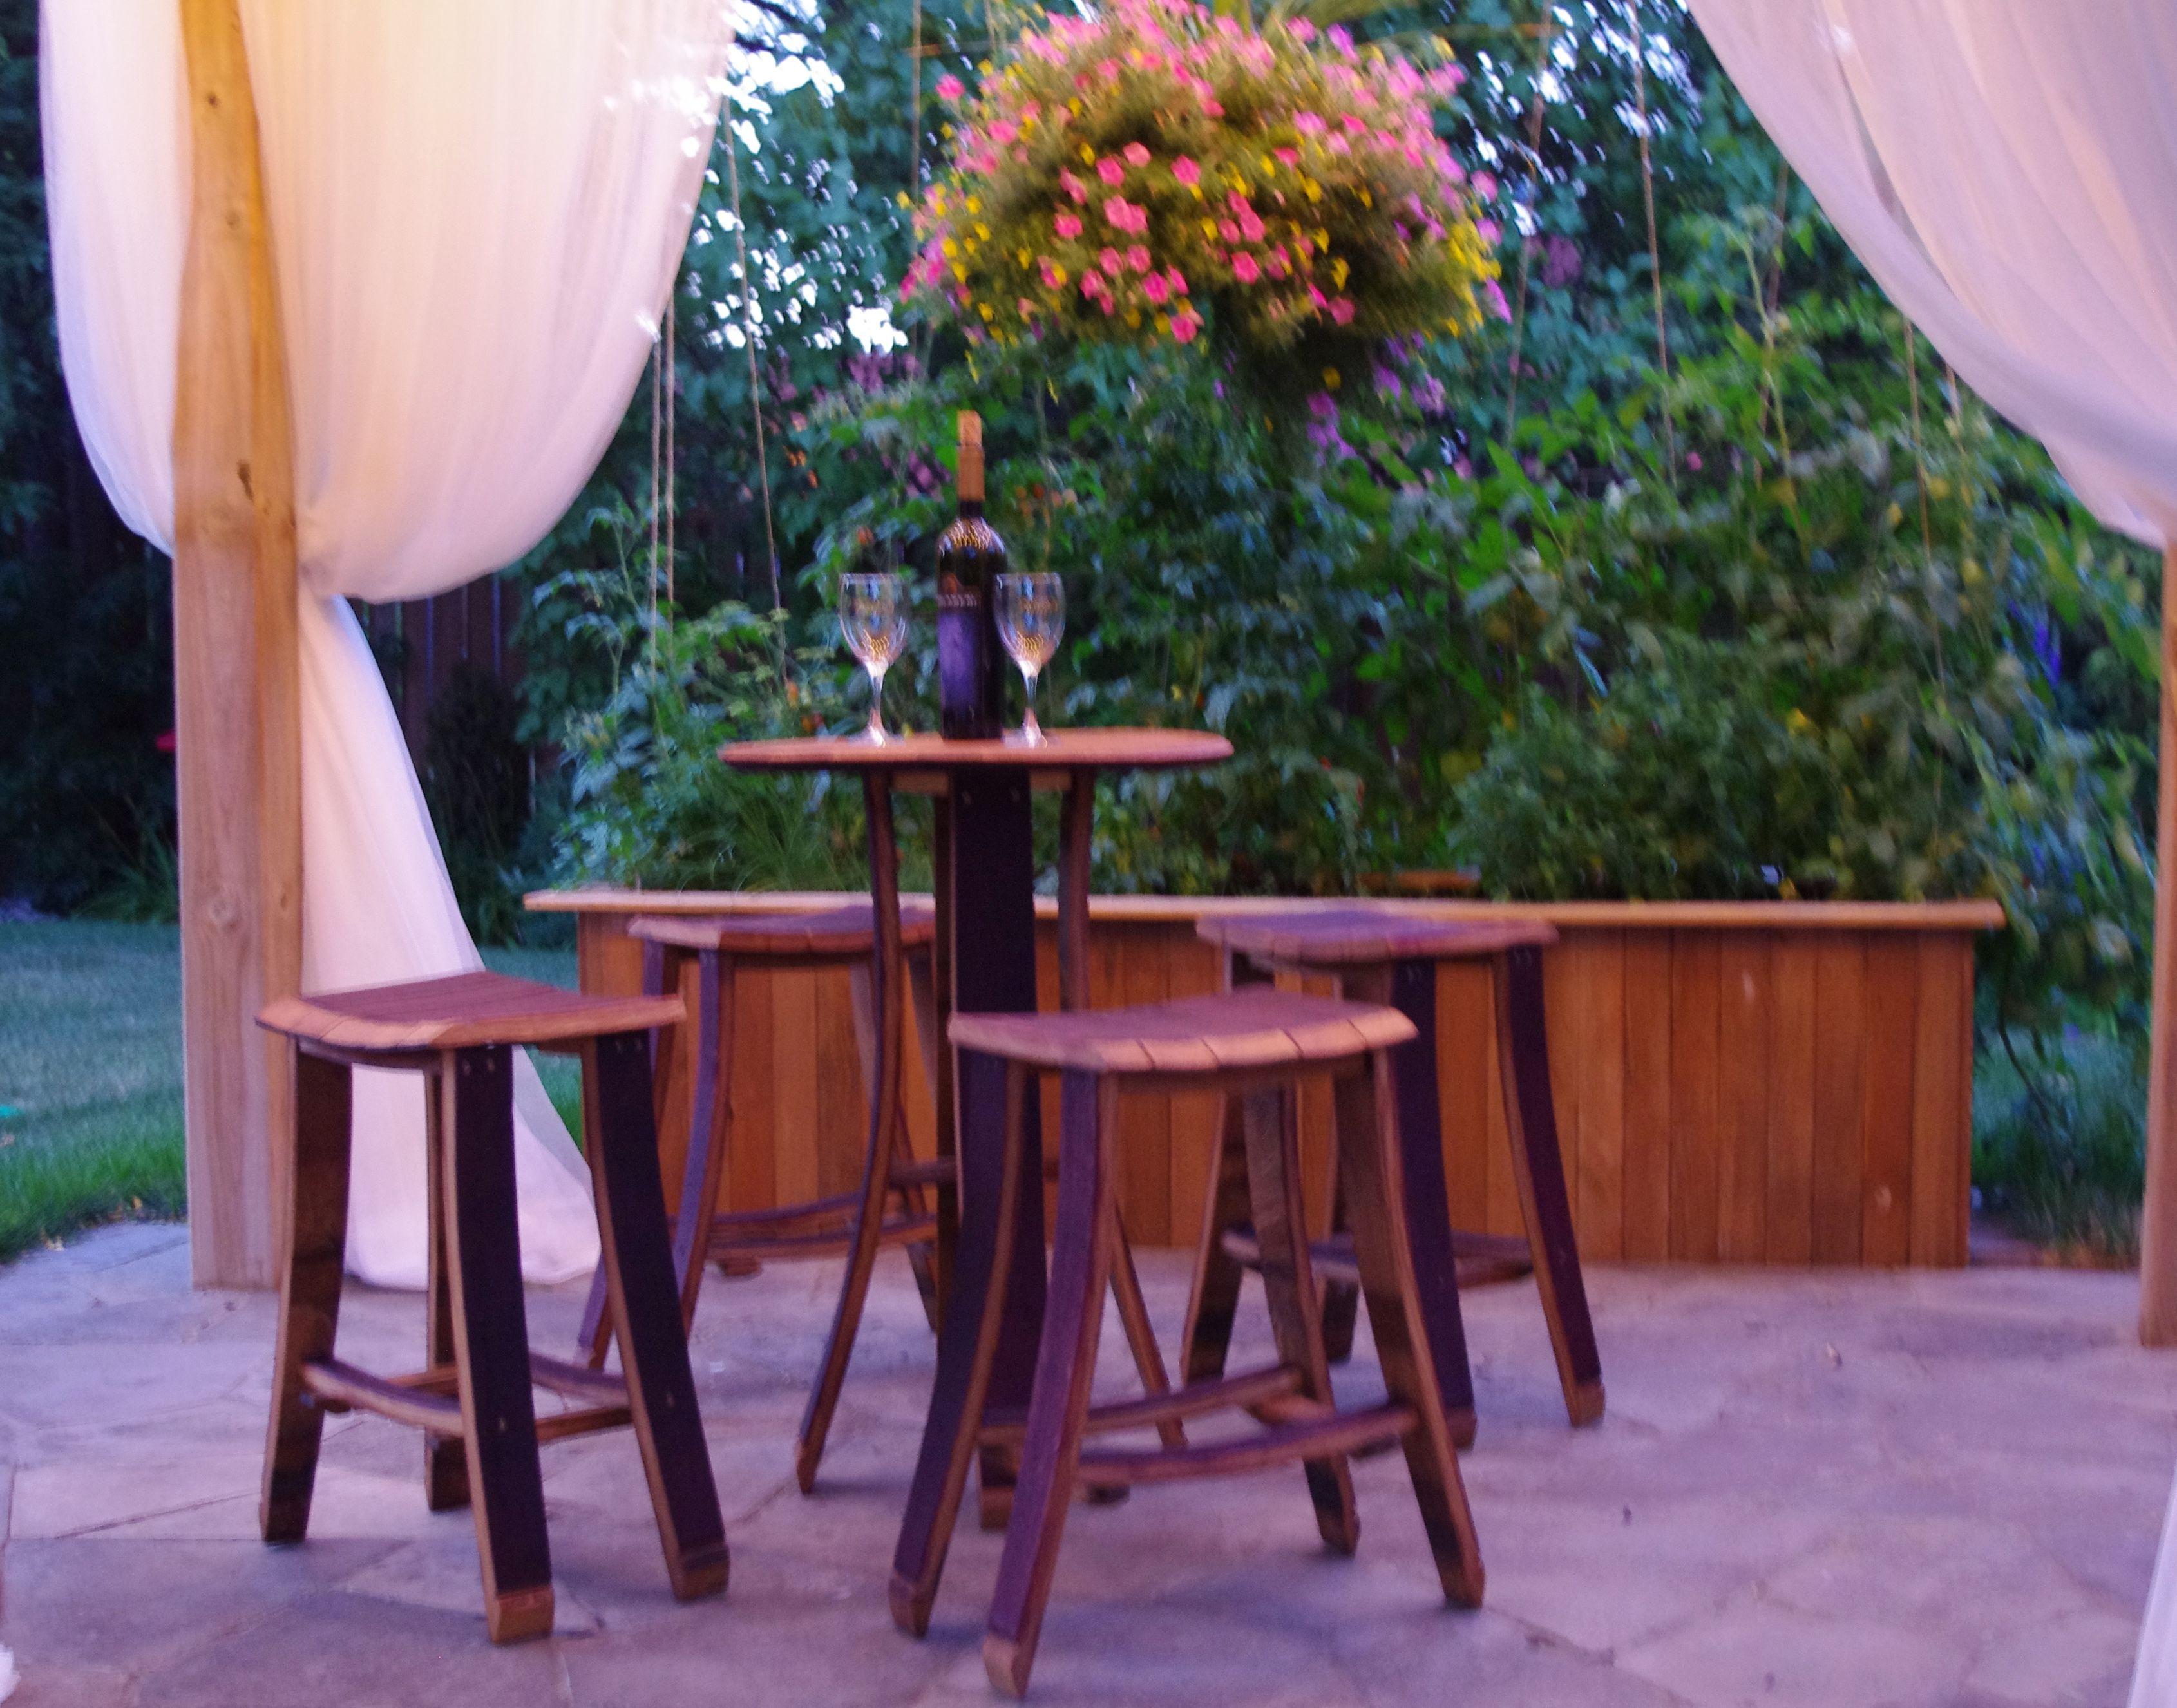 Wine Barrel Table & Stools By Backyard Barrel Company $699